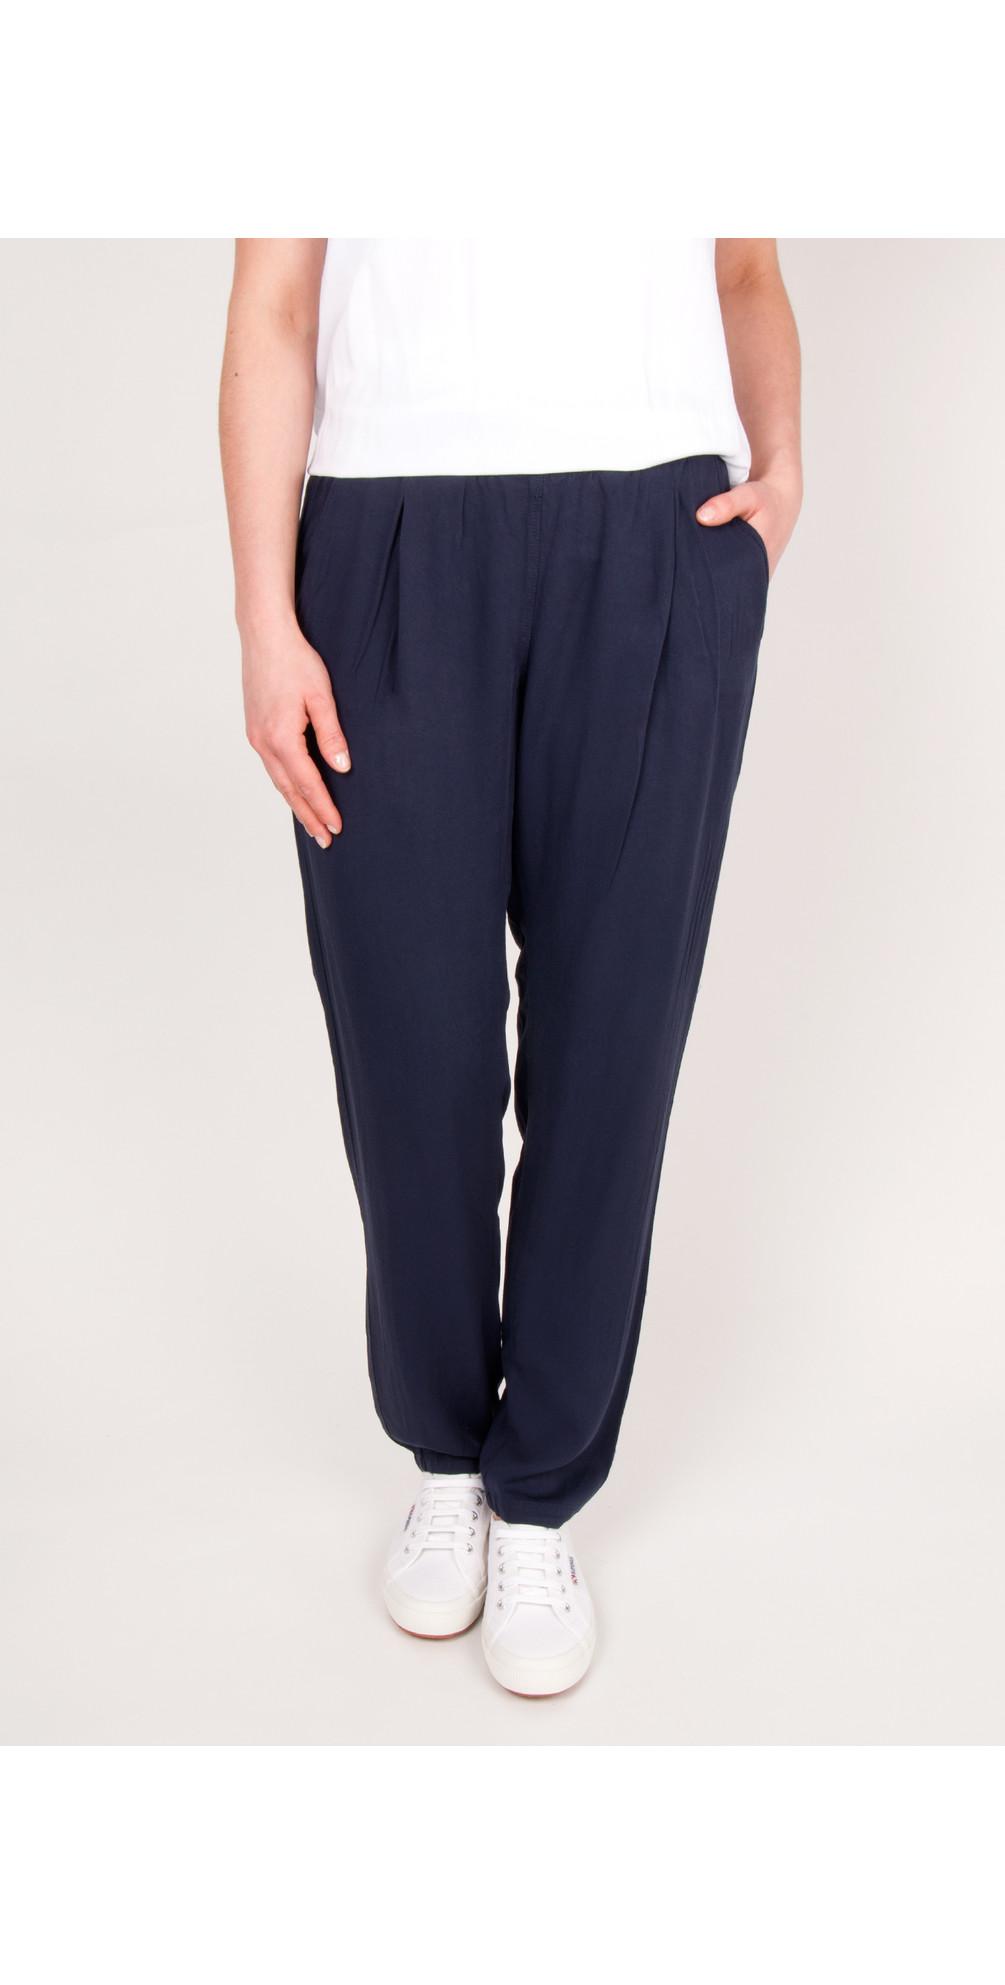 Sienna Garment Wash Pants main image